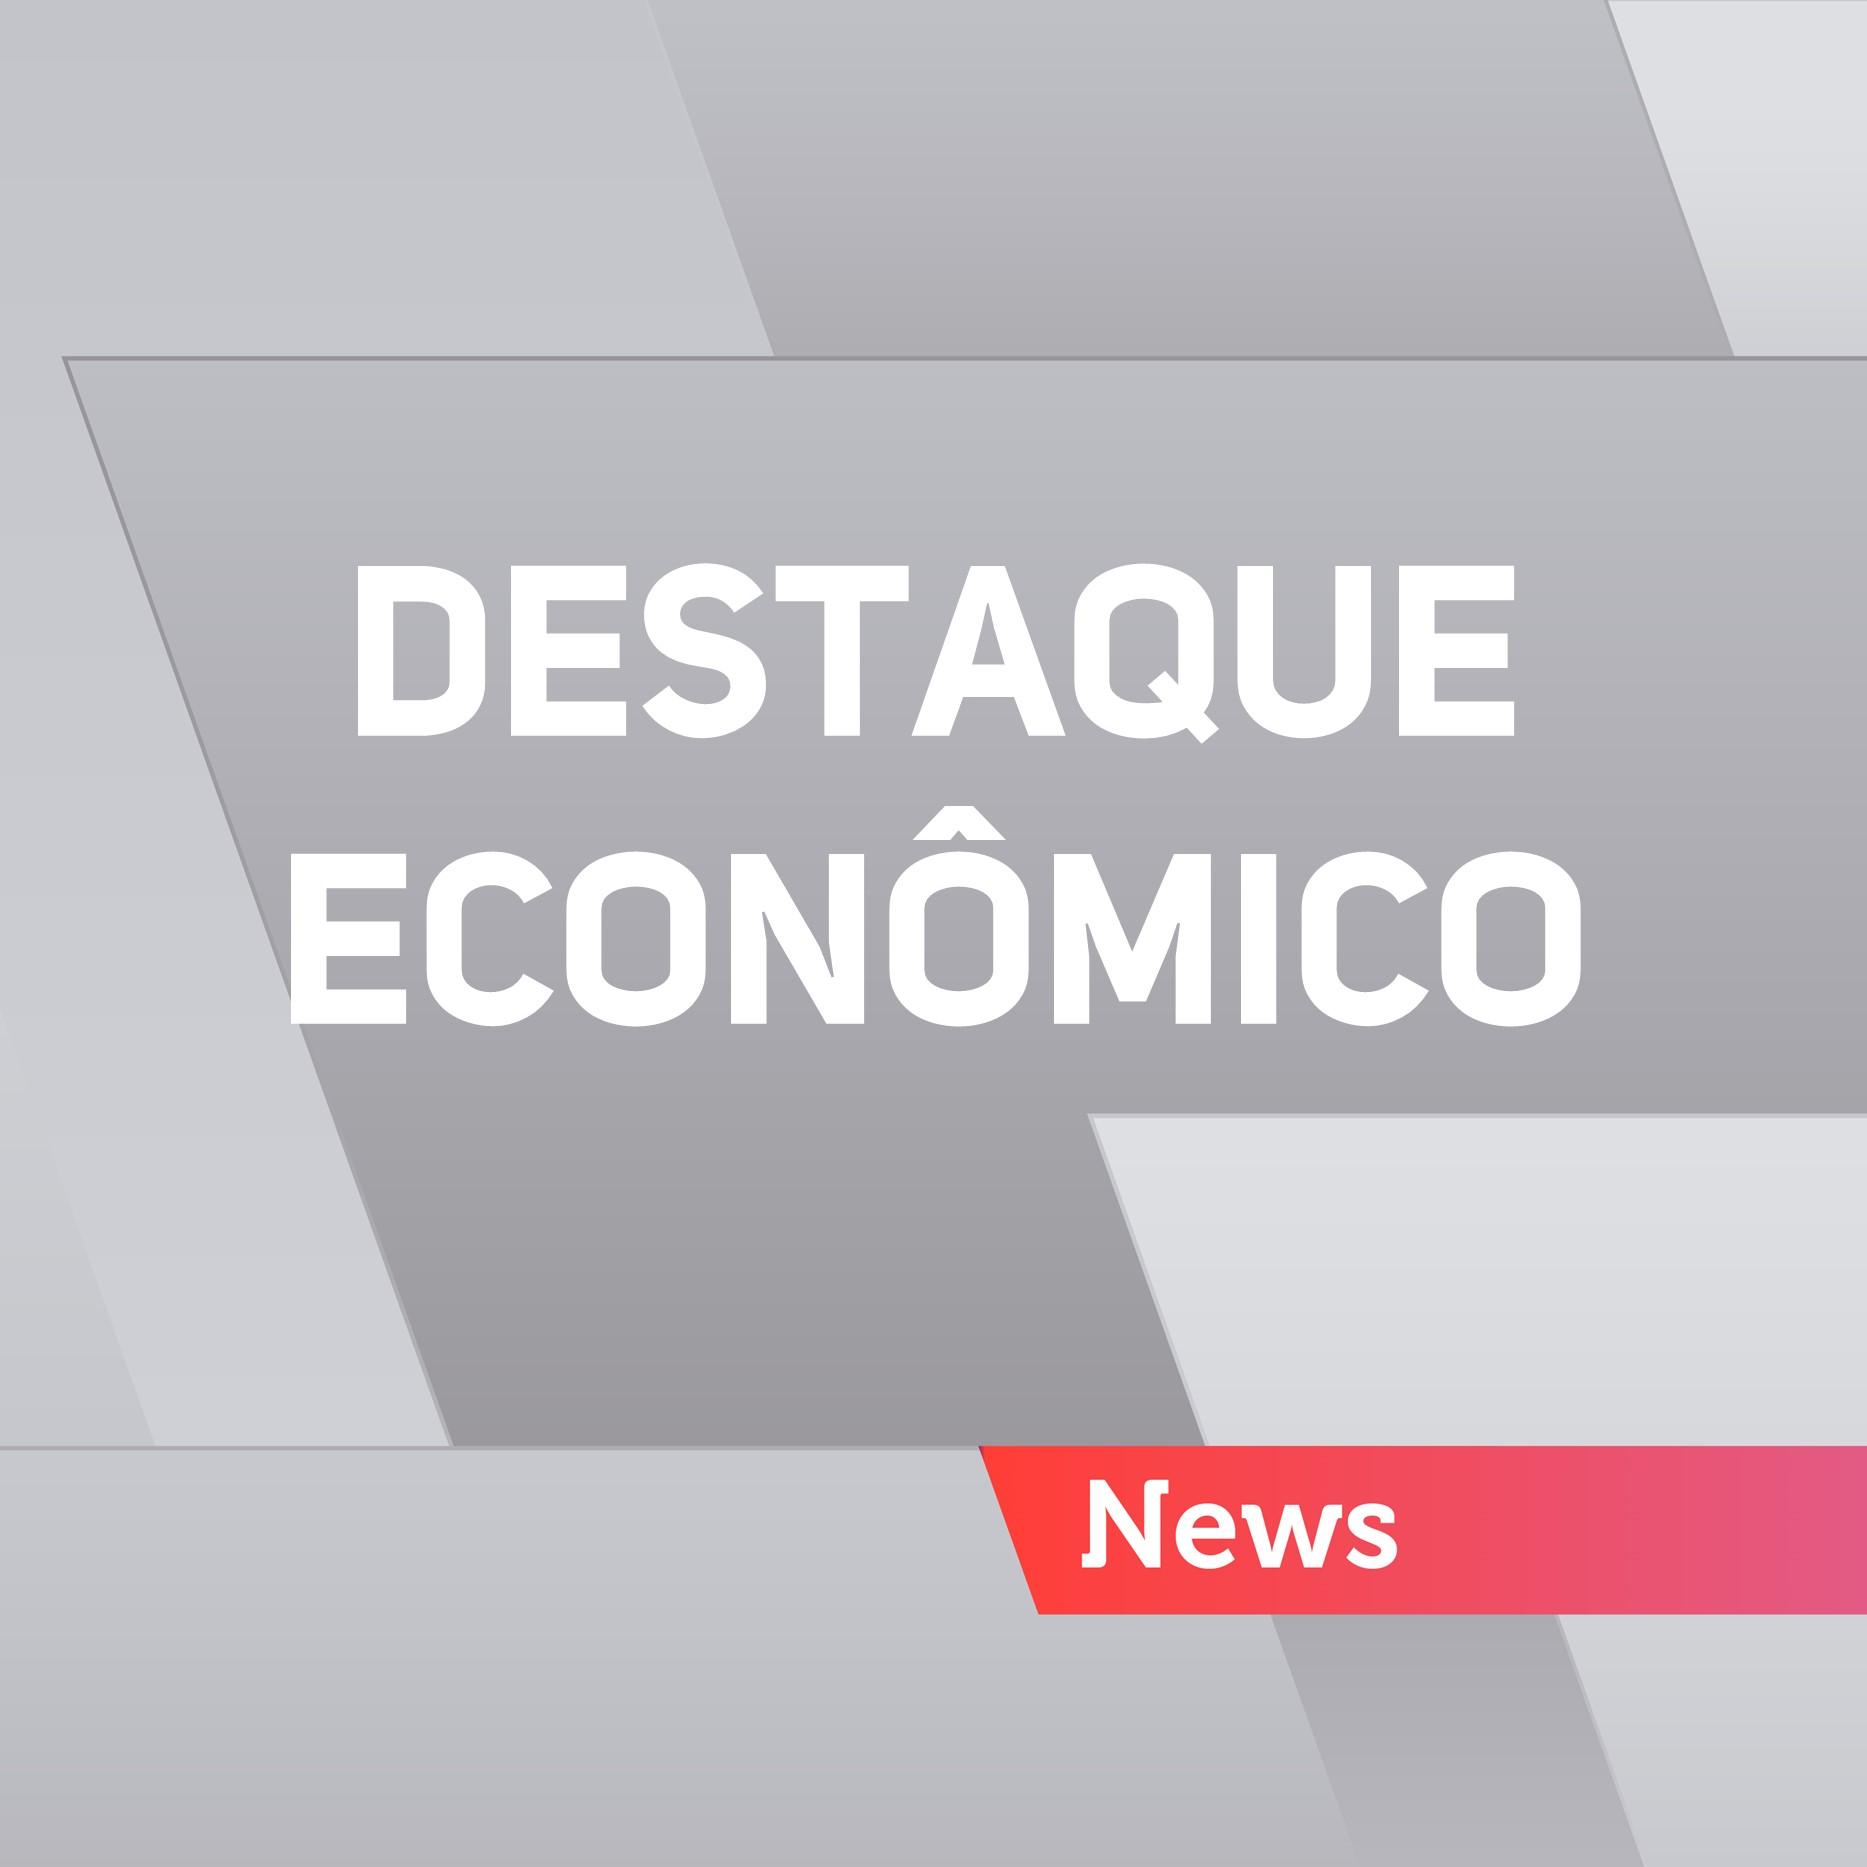 Destaque Economico = 23/04/2017